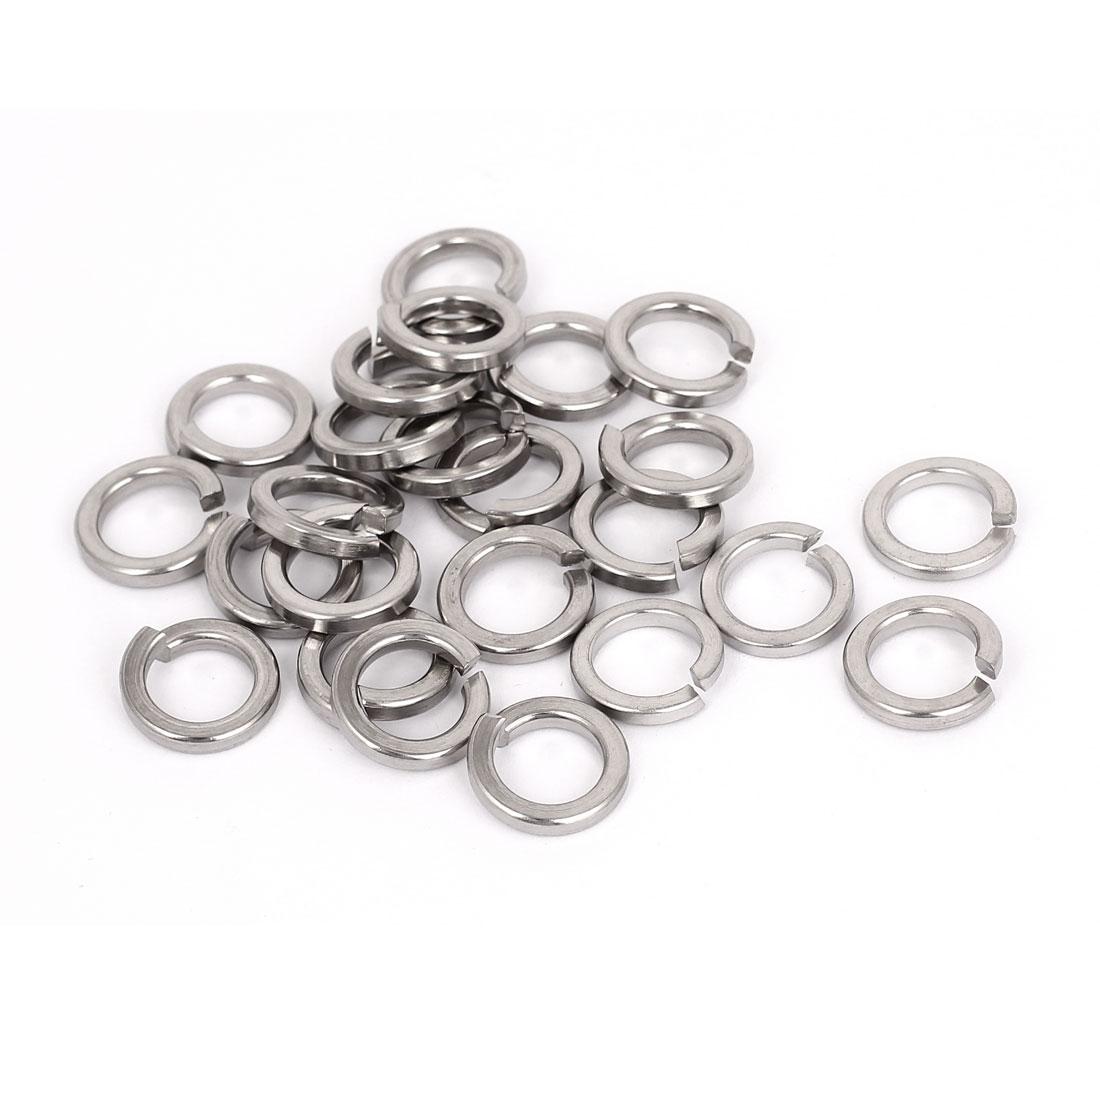 25pcs 304 Stainless Steel Split Lock Spring Washers M12 Screw Gasket Pad